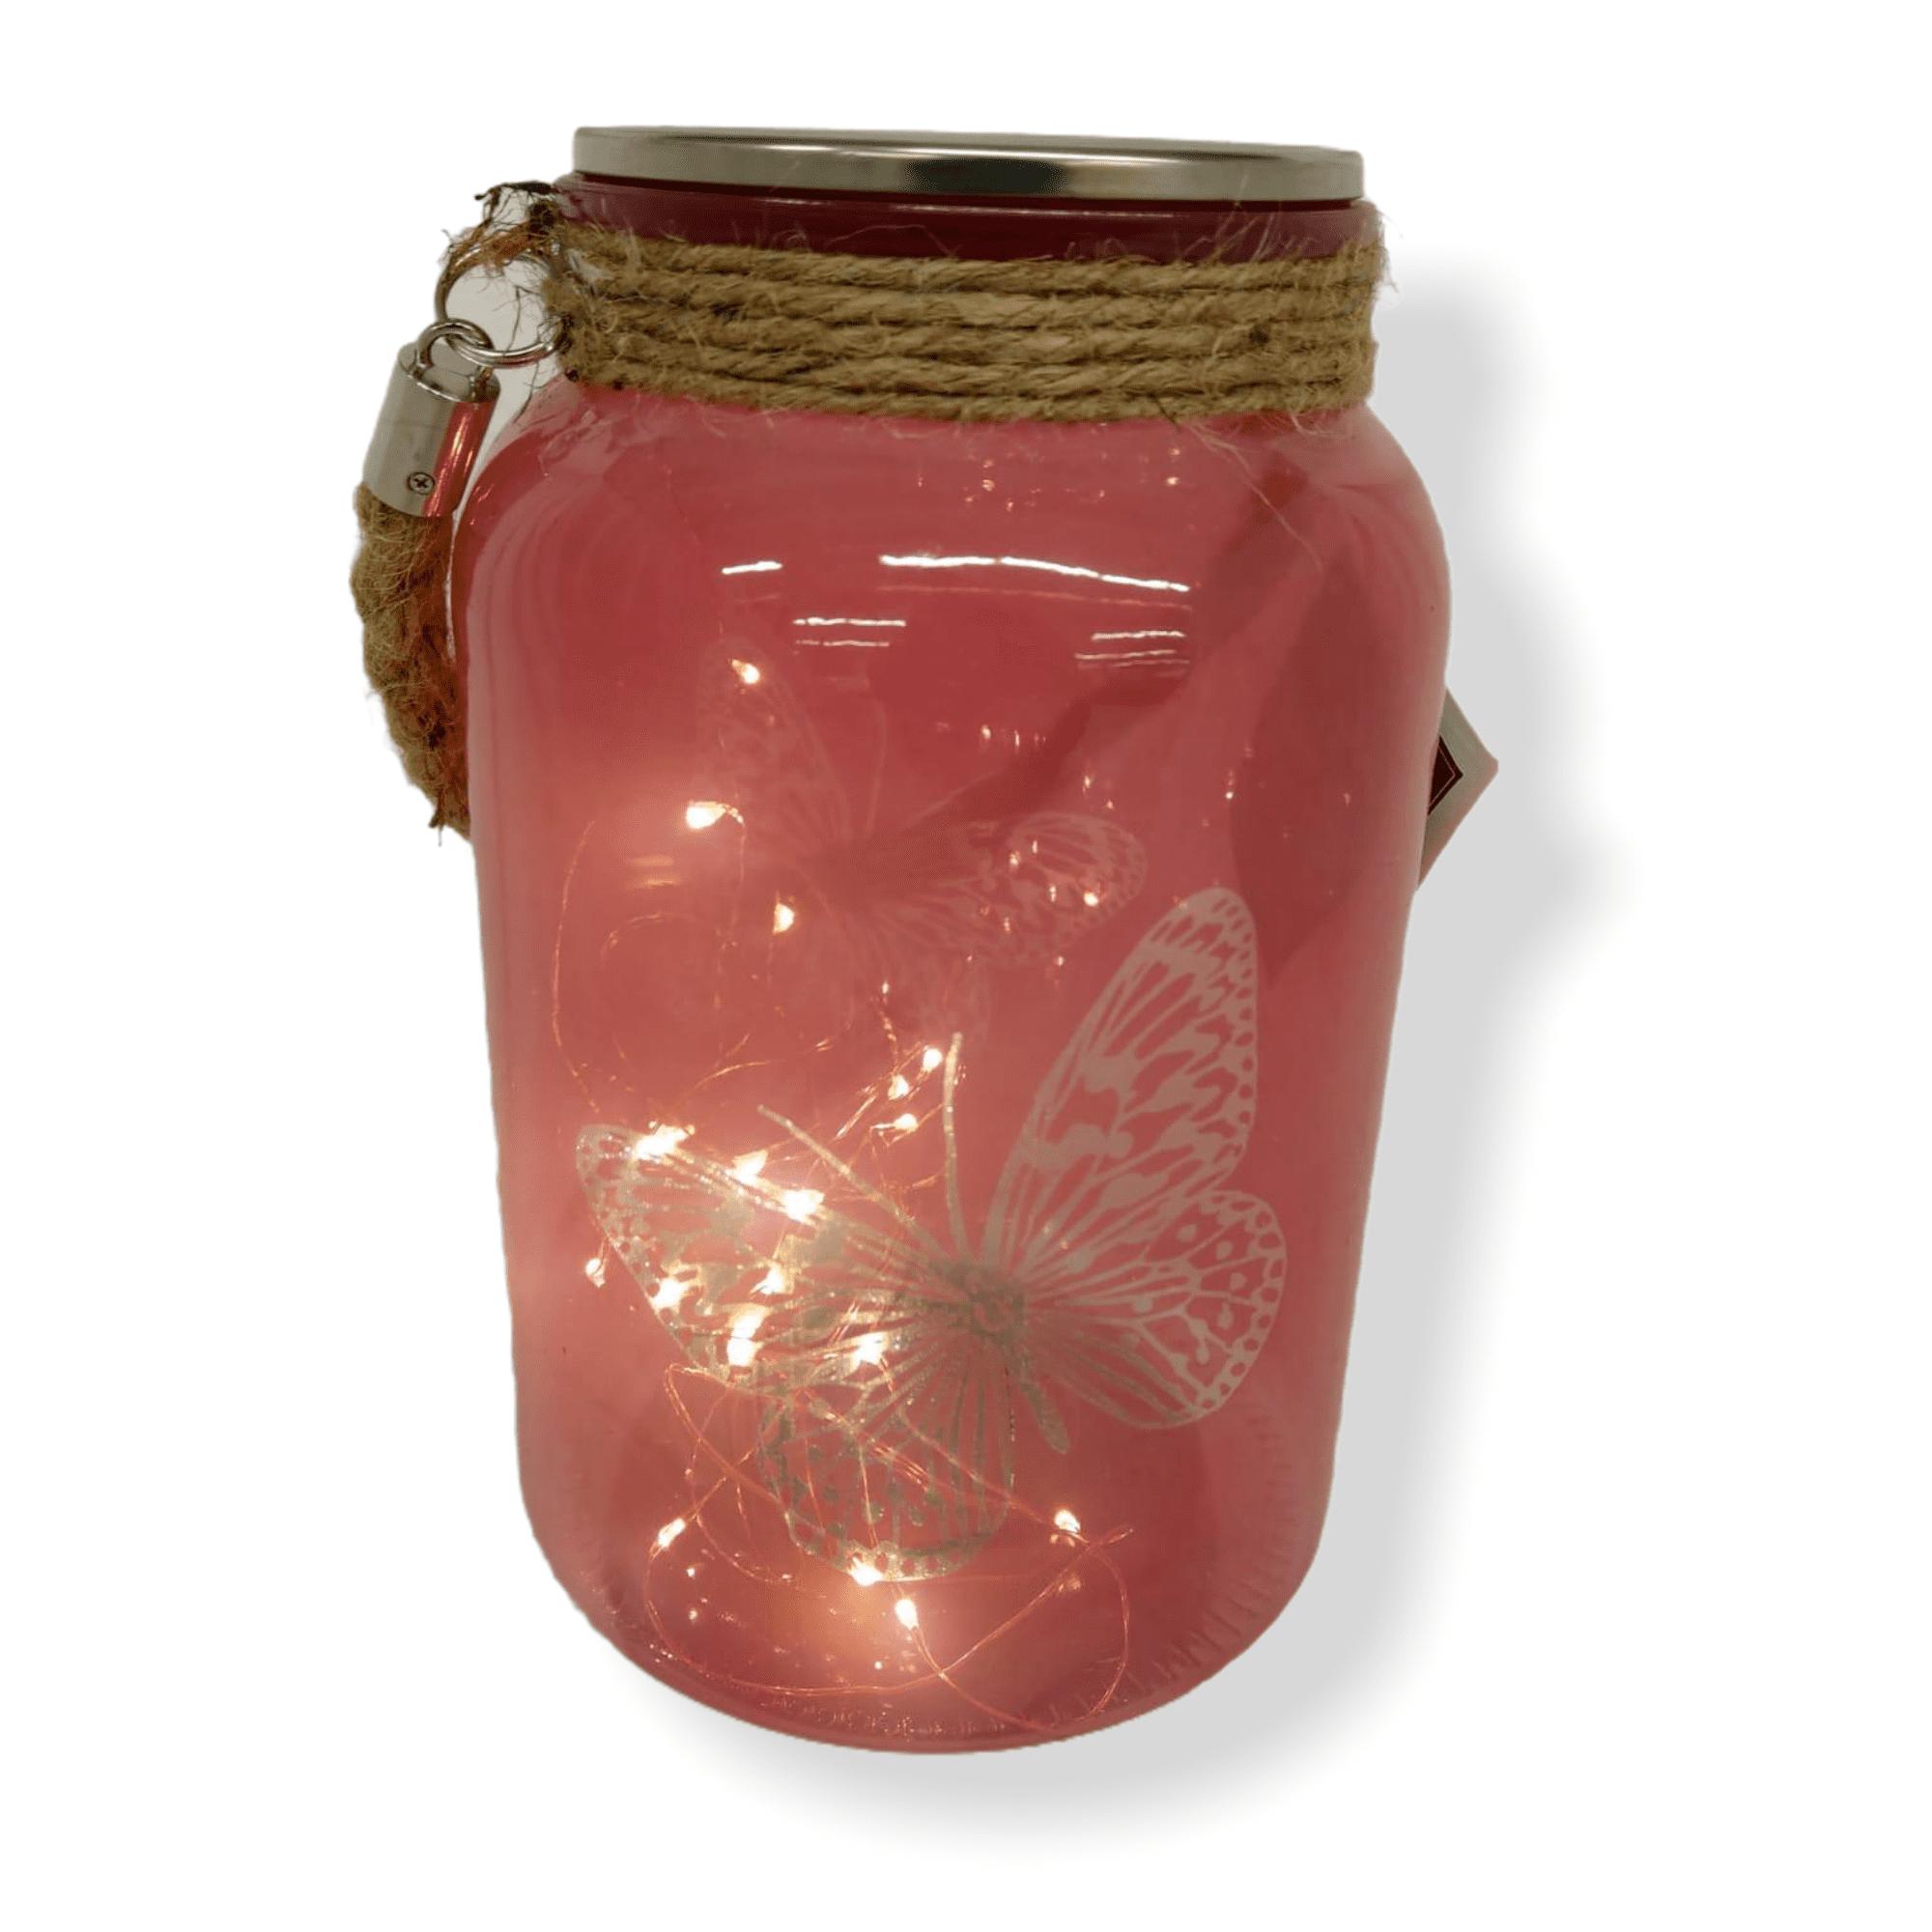 "LED Windlicht ""Pelo"" mit Schmetterlingsmotiv"